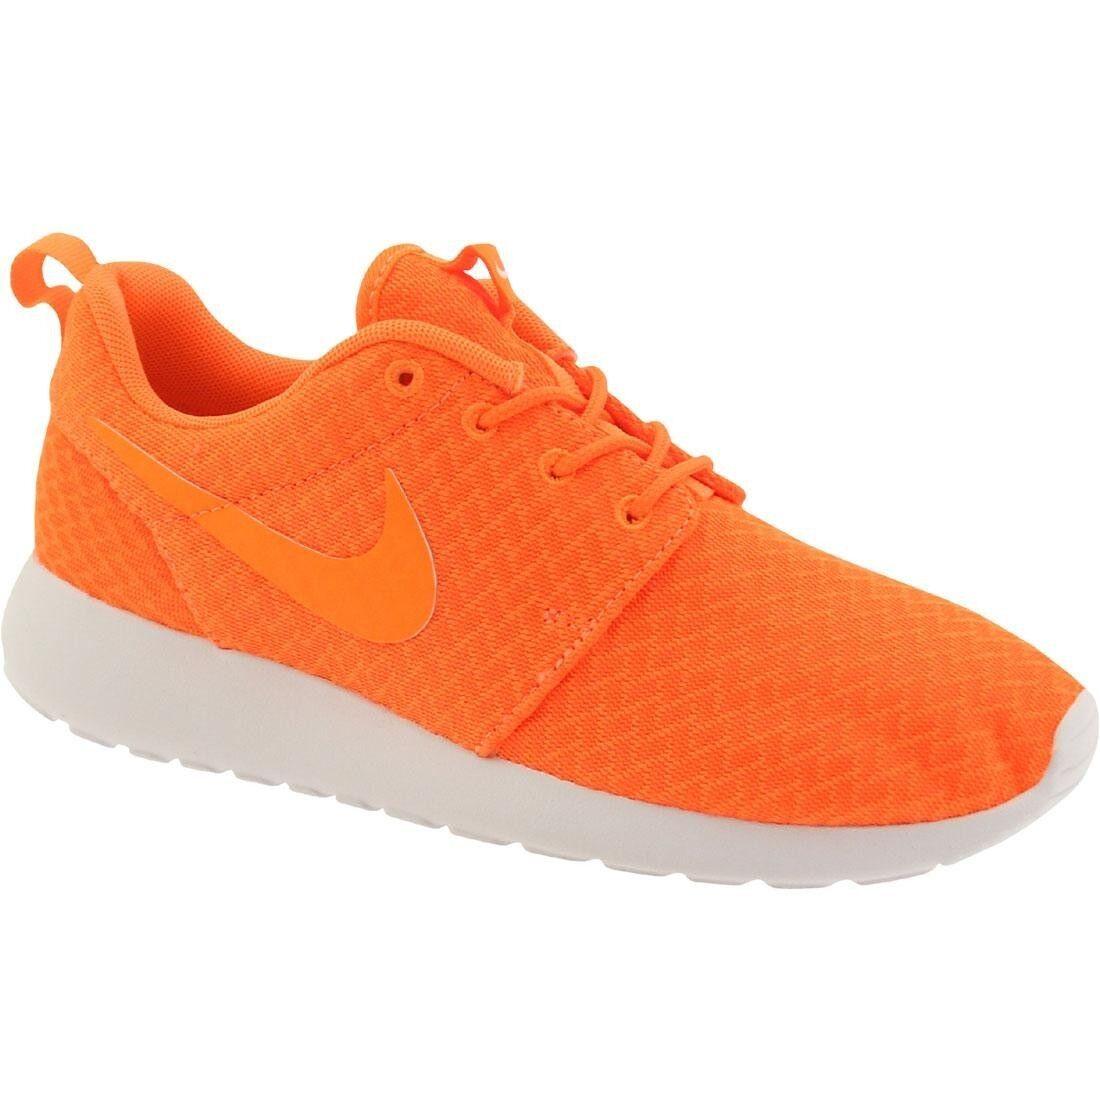 US Taille Nike femmes Blanc Roshe One One One total orange 6830a9